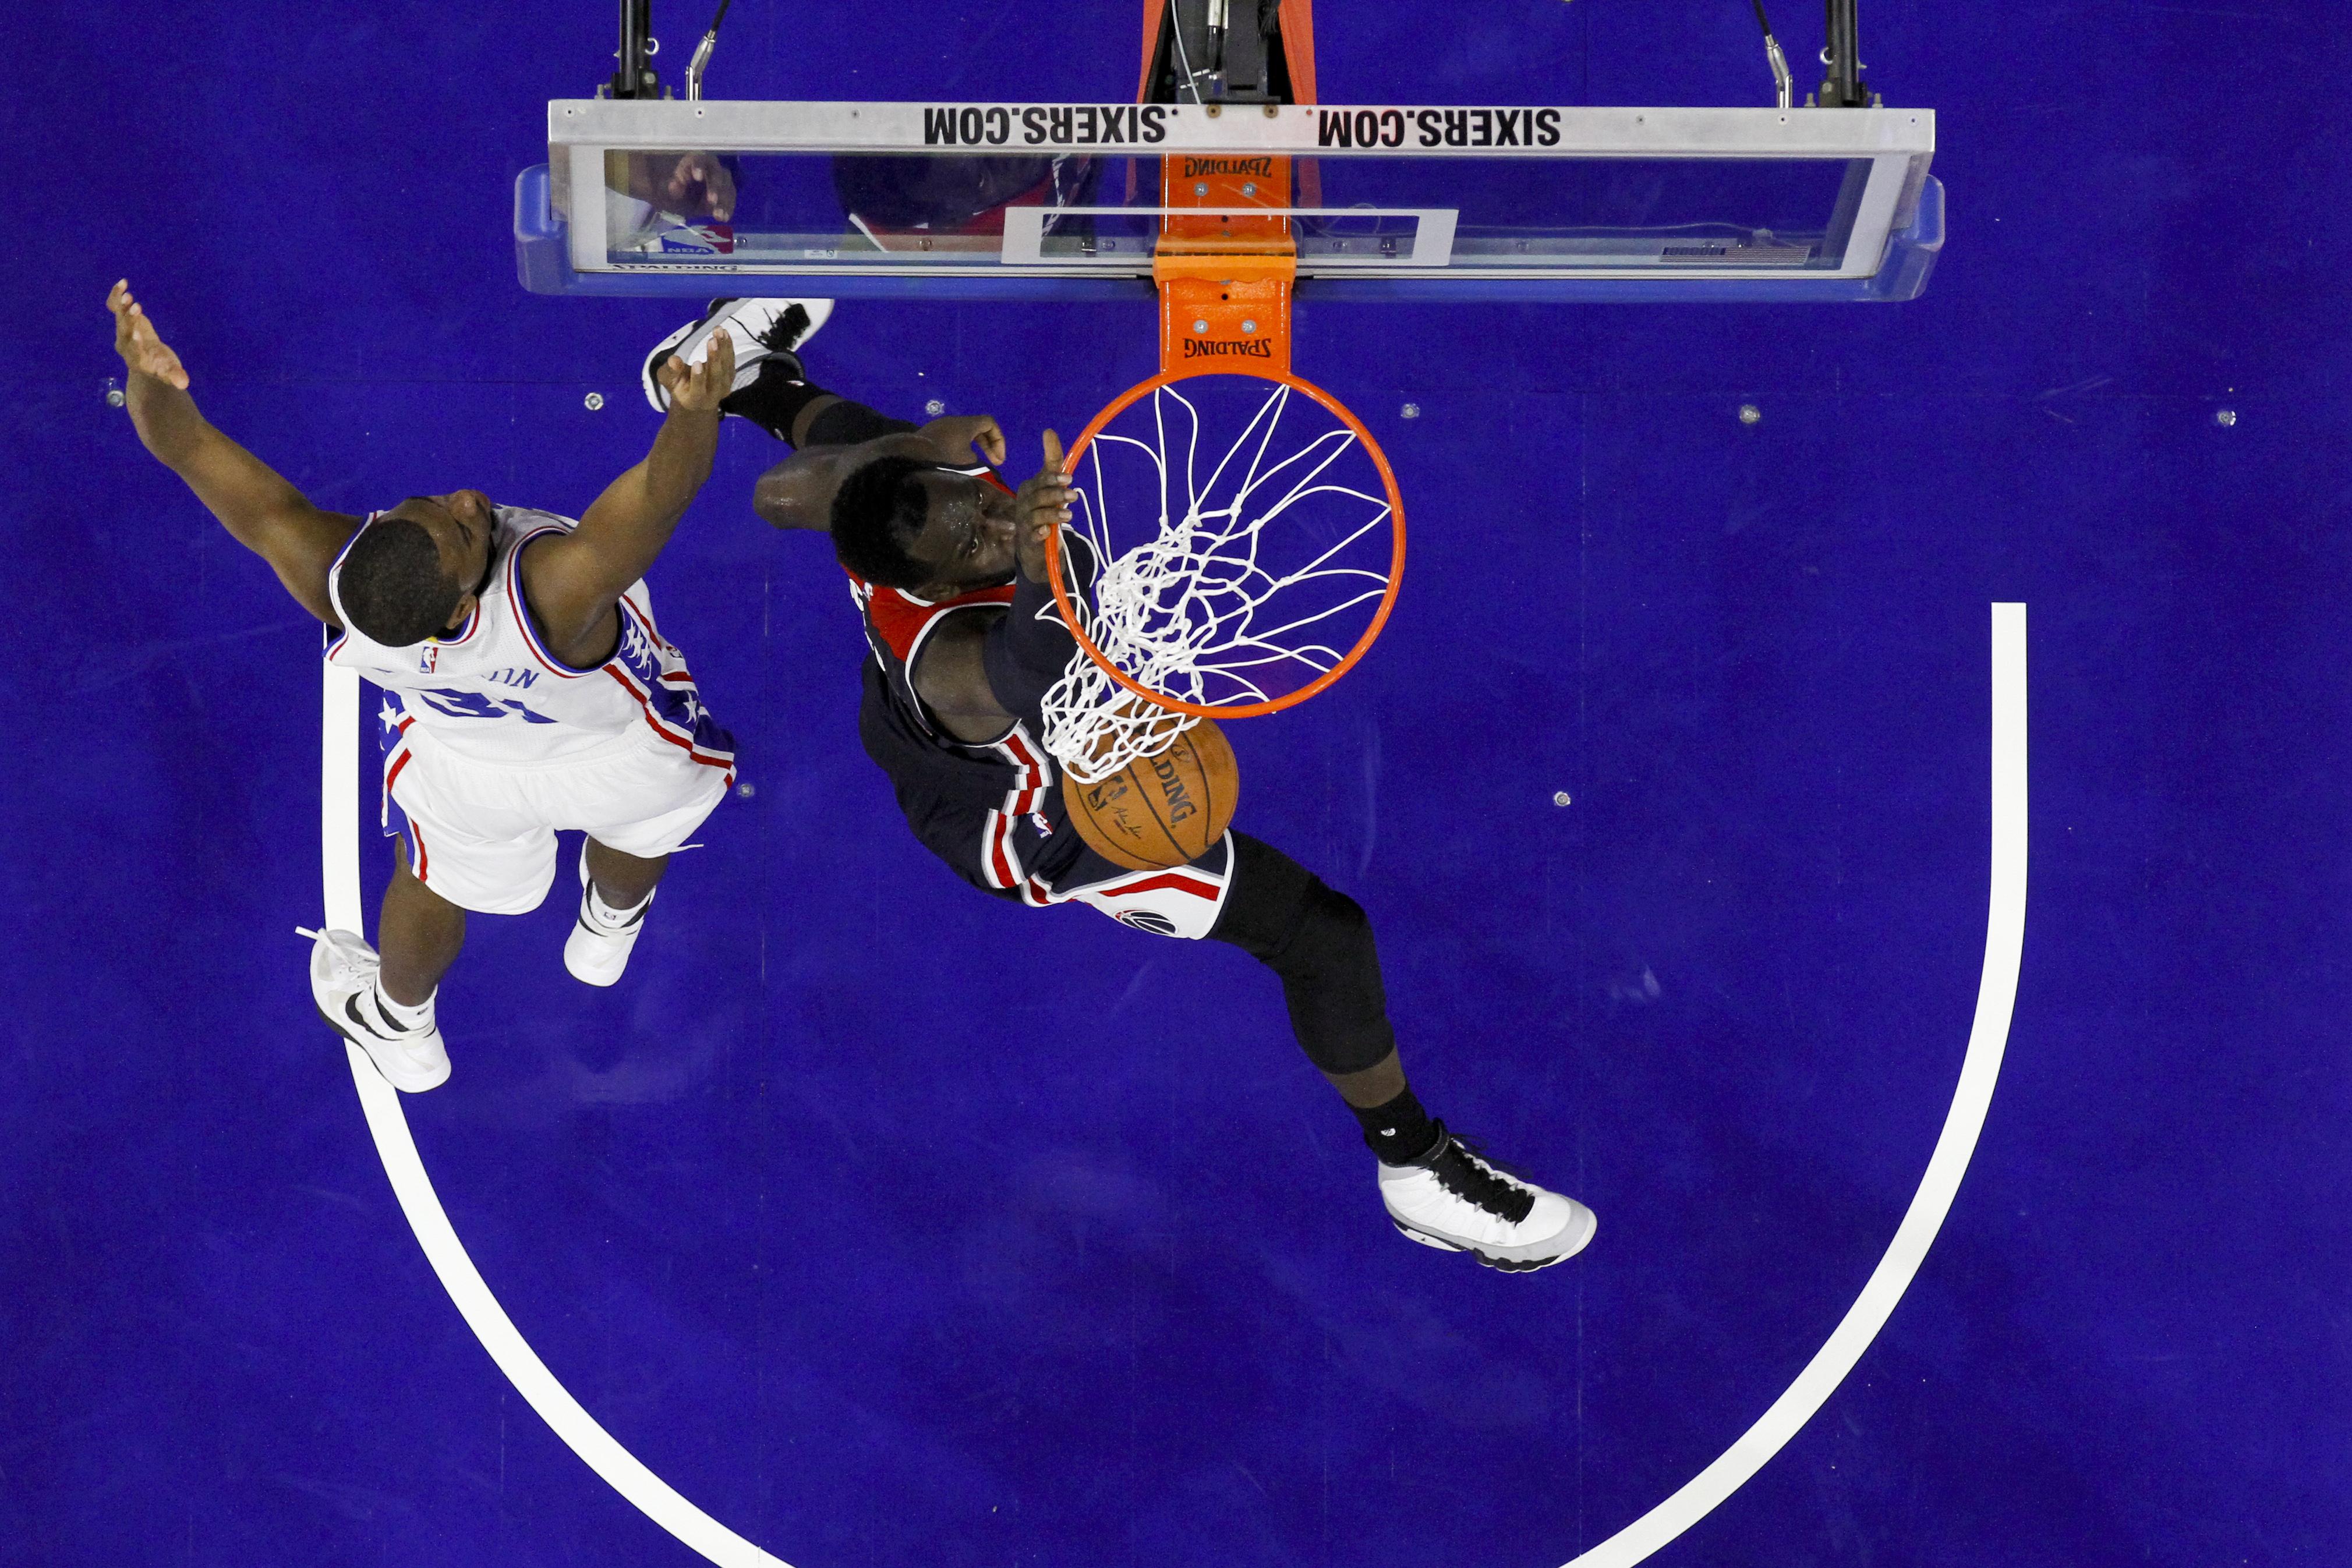 Wizards_76ers_basketball.jpeg-07ea3